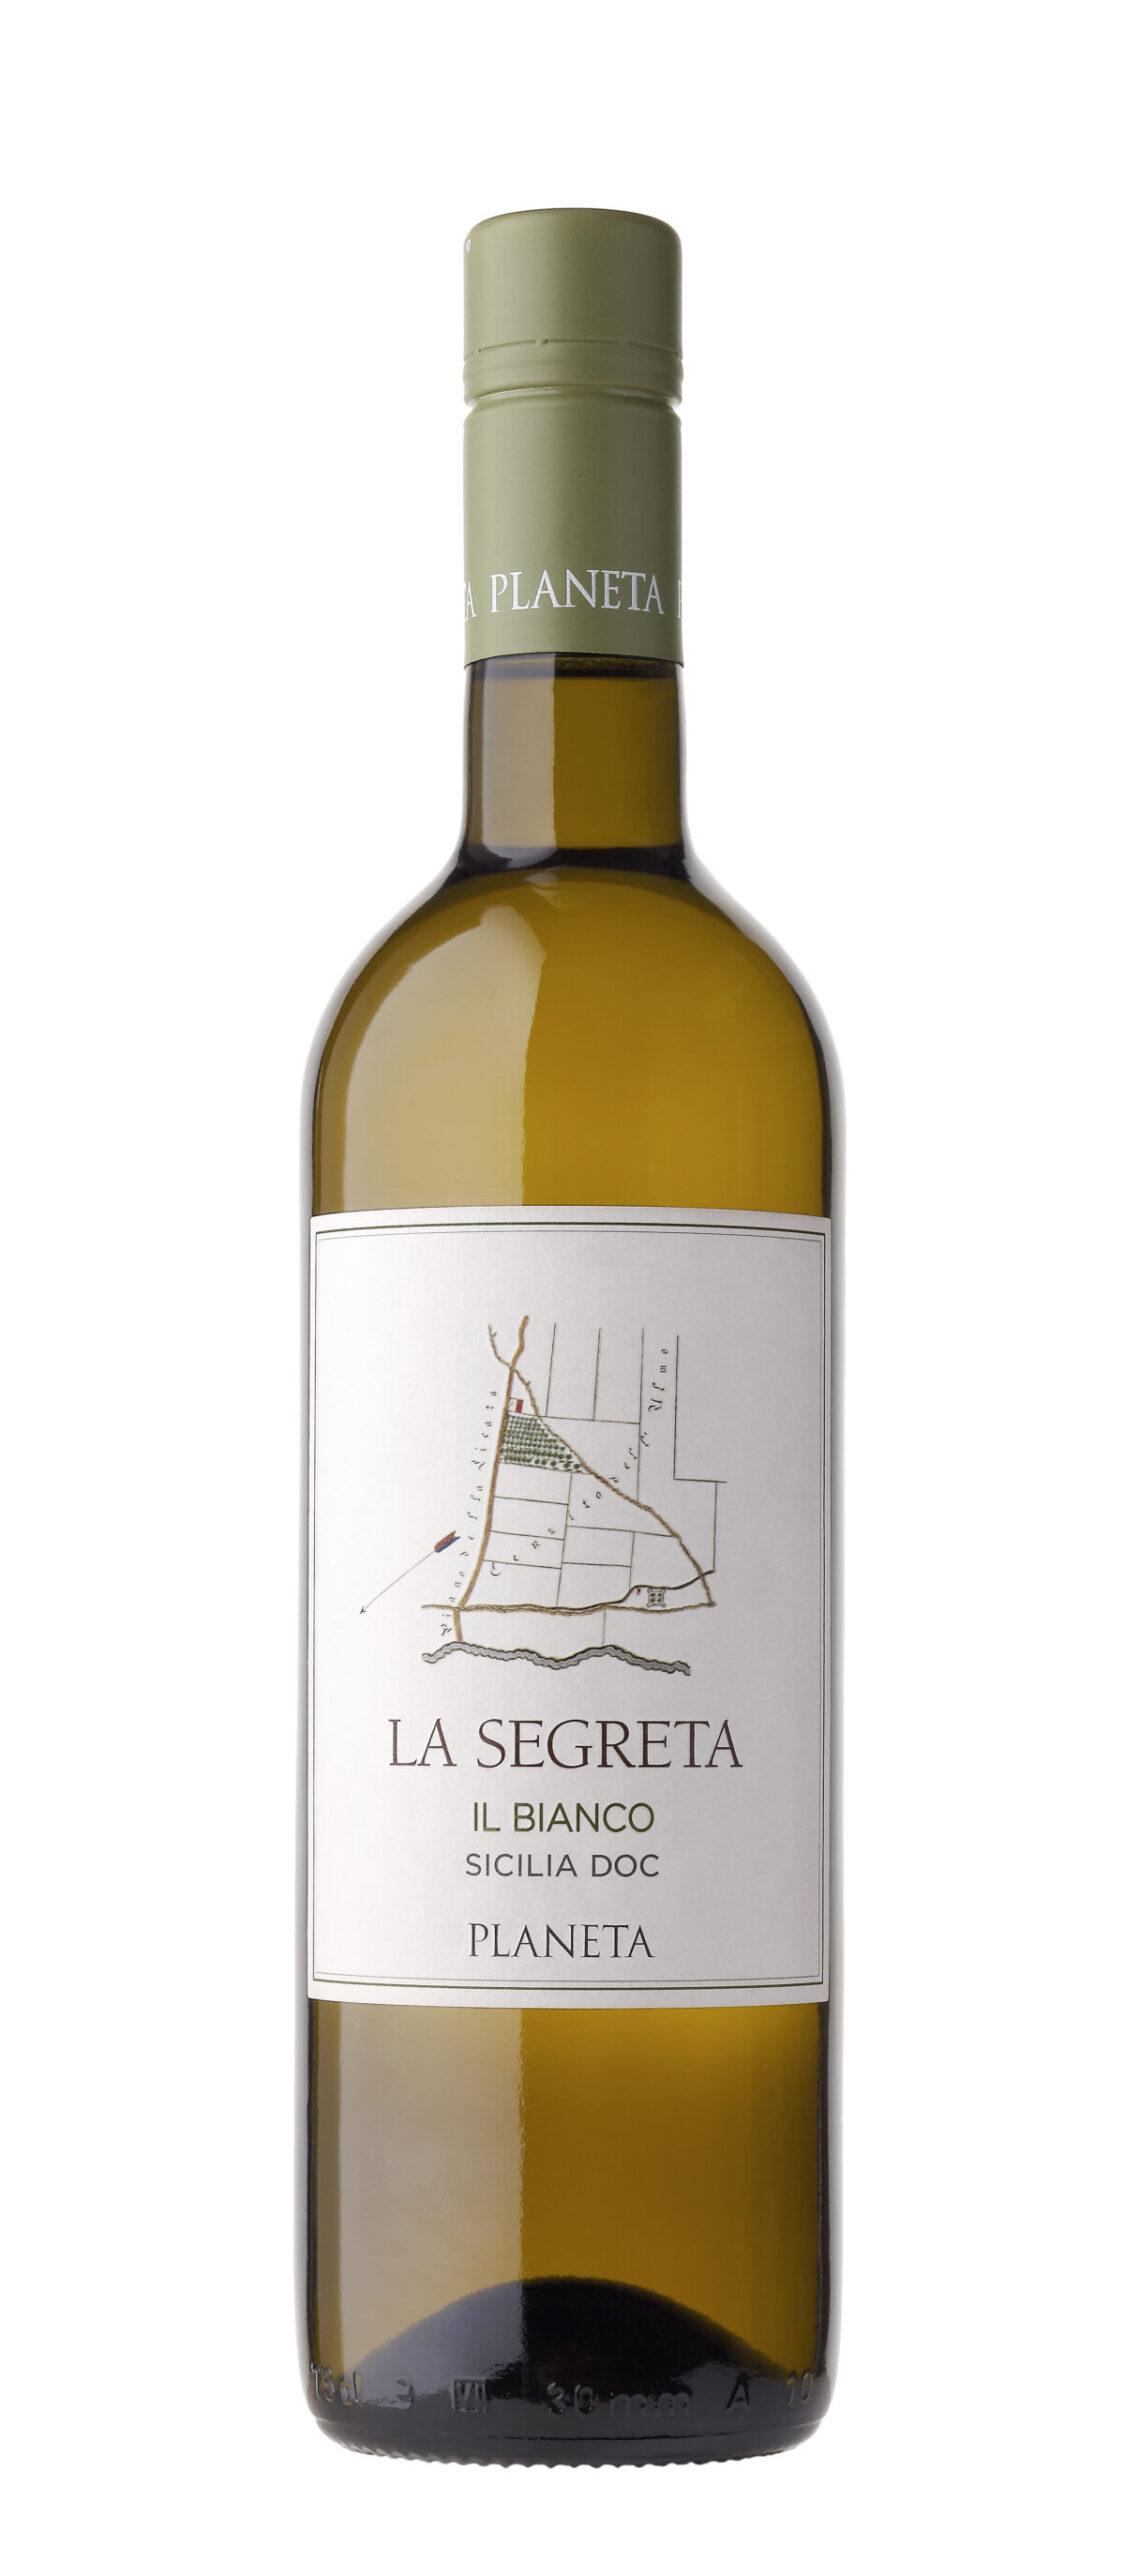 La Segreta Il Bianco ラ・セグレタ・ビアンコ 750ml